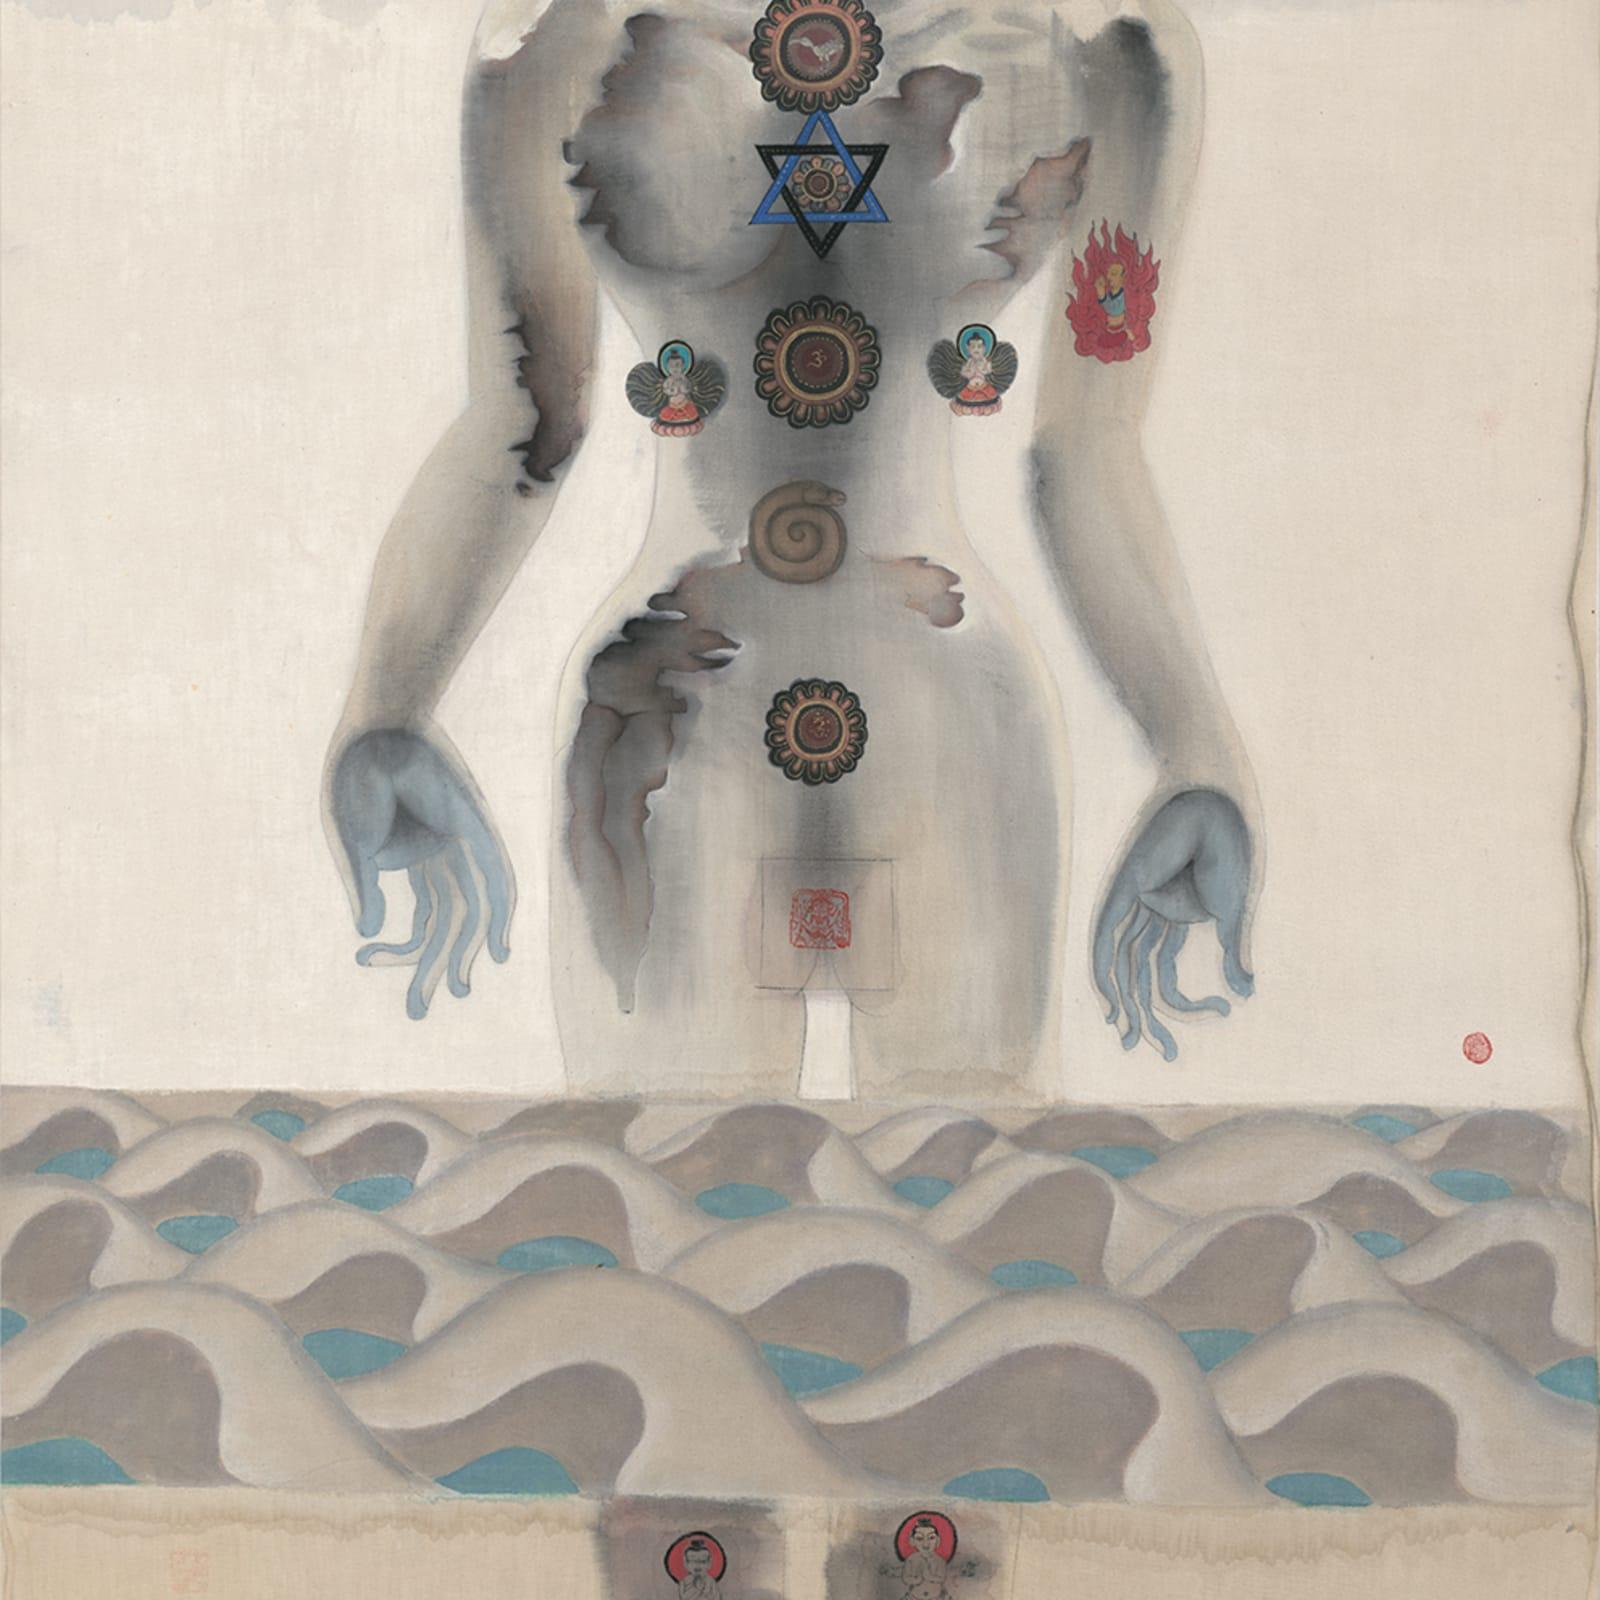 Li Jin 李津, Lhasa River Heart Sutra 拉萨河心经, 1992